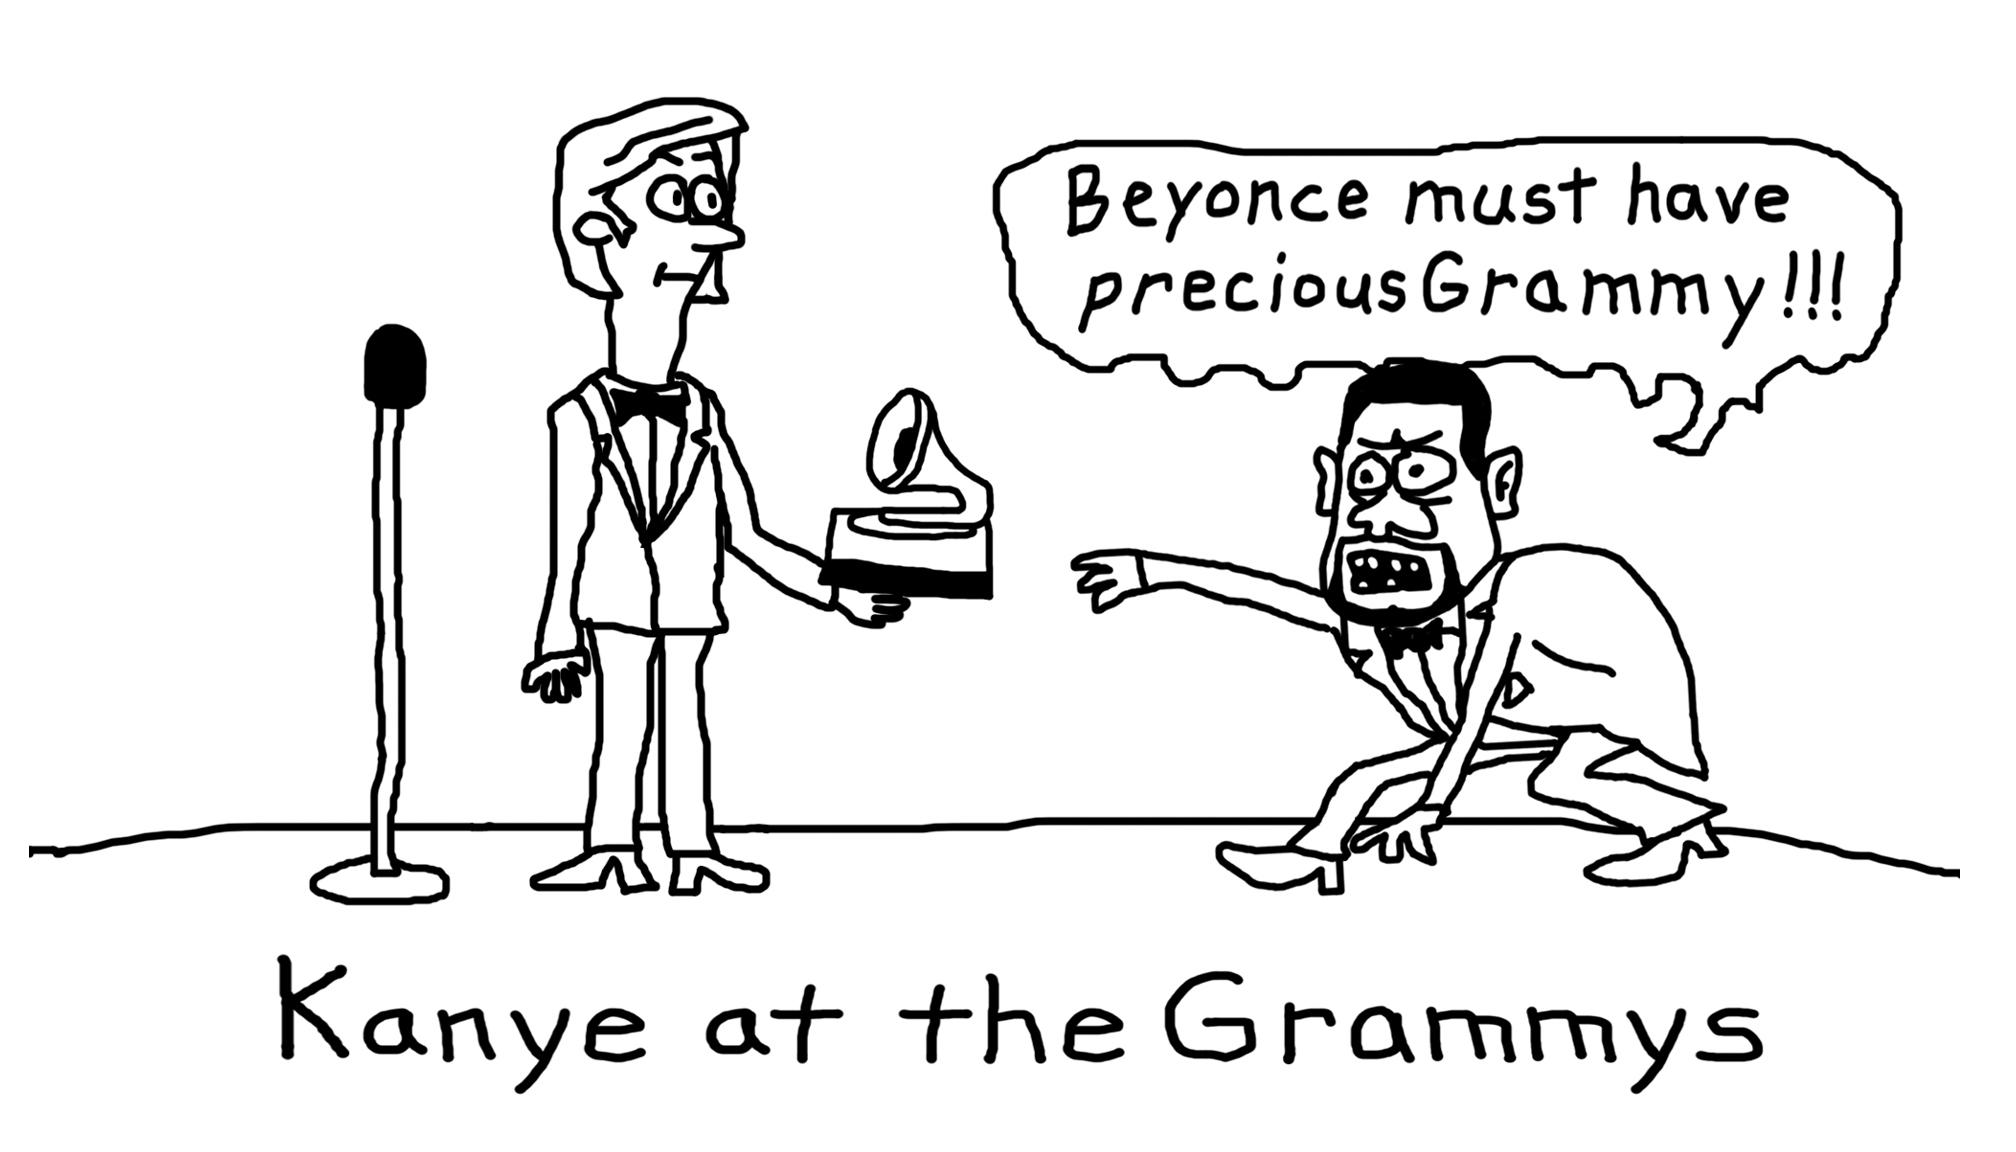 Kanye at the Grammys